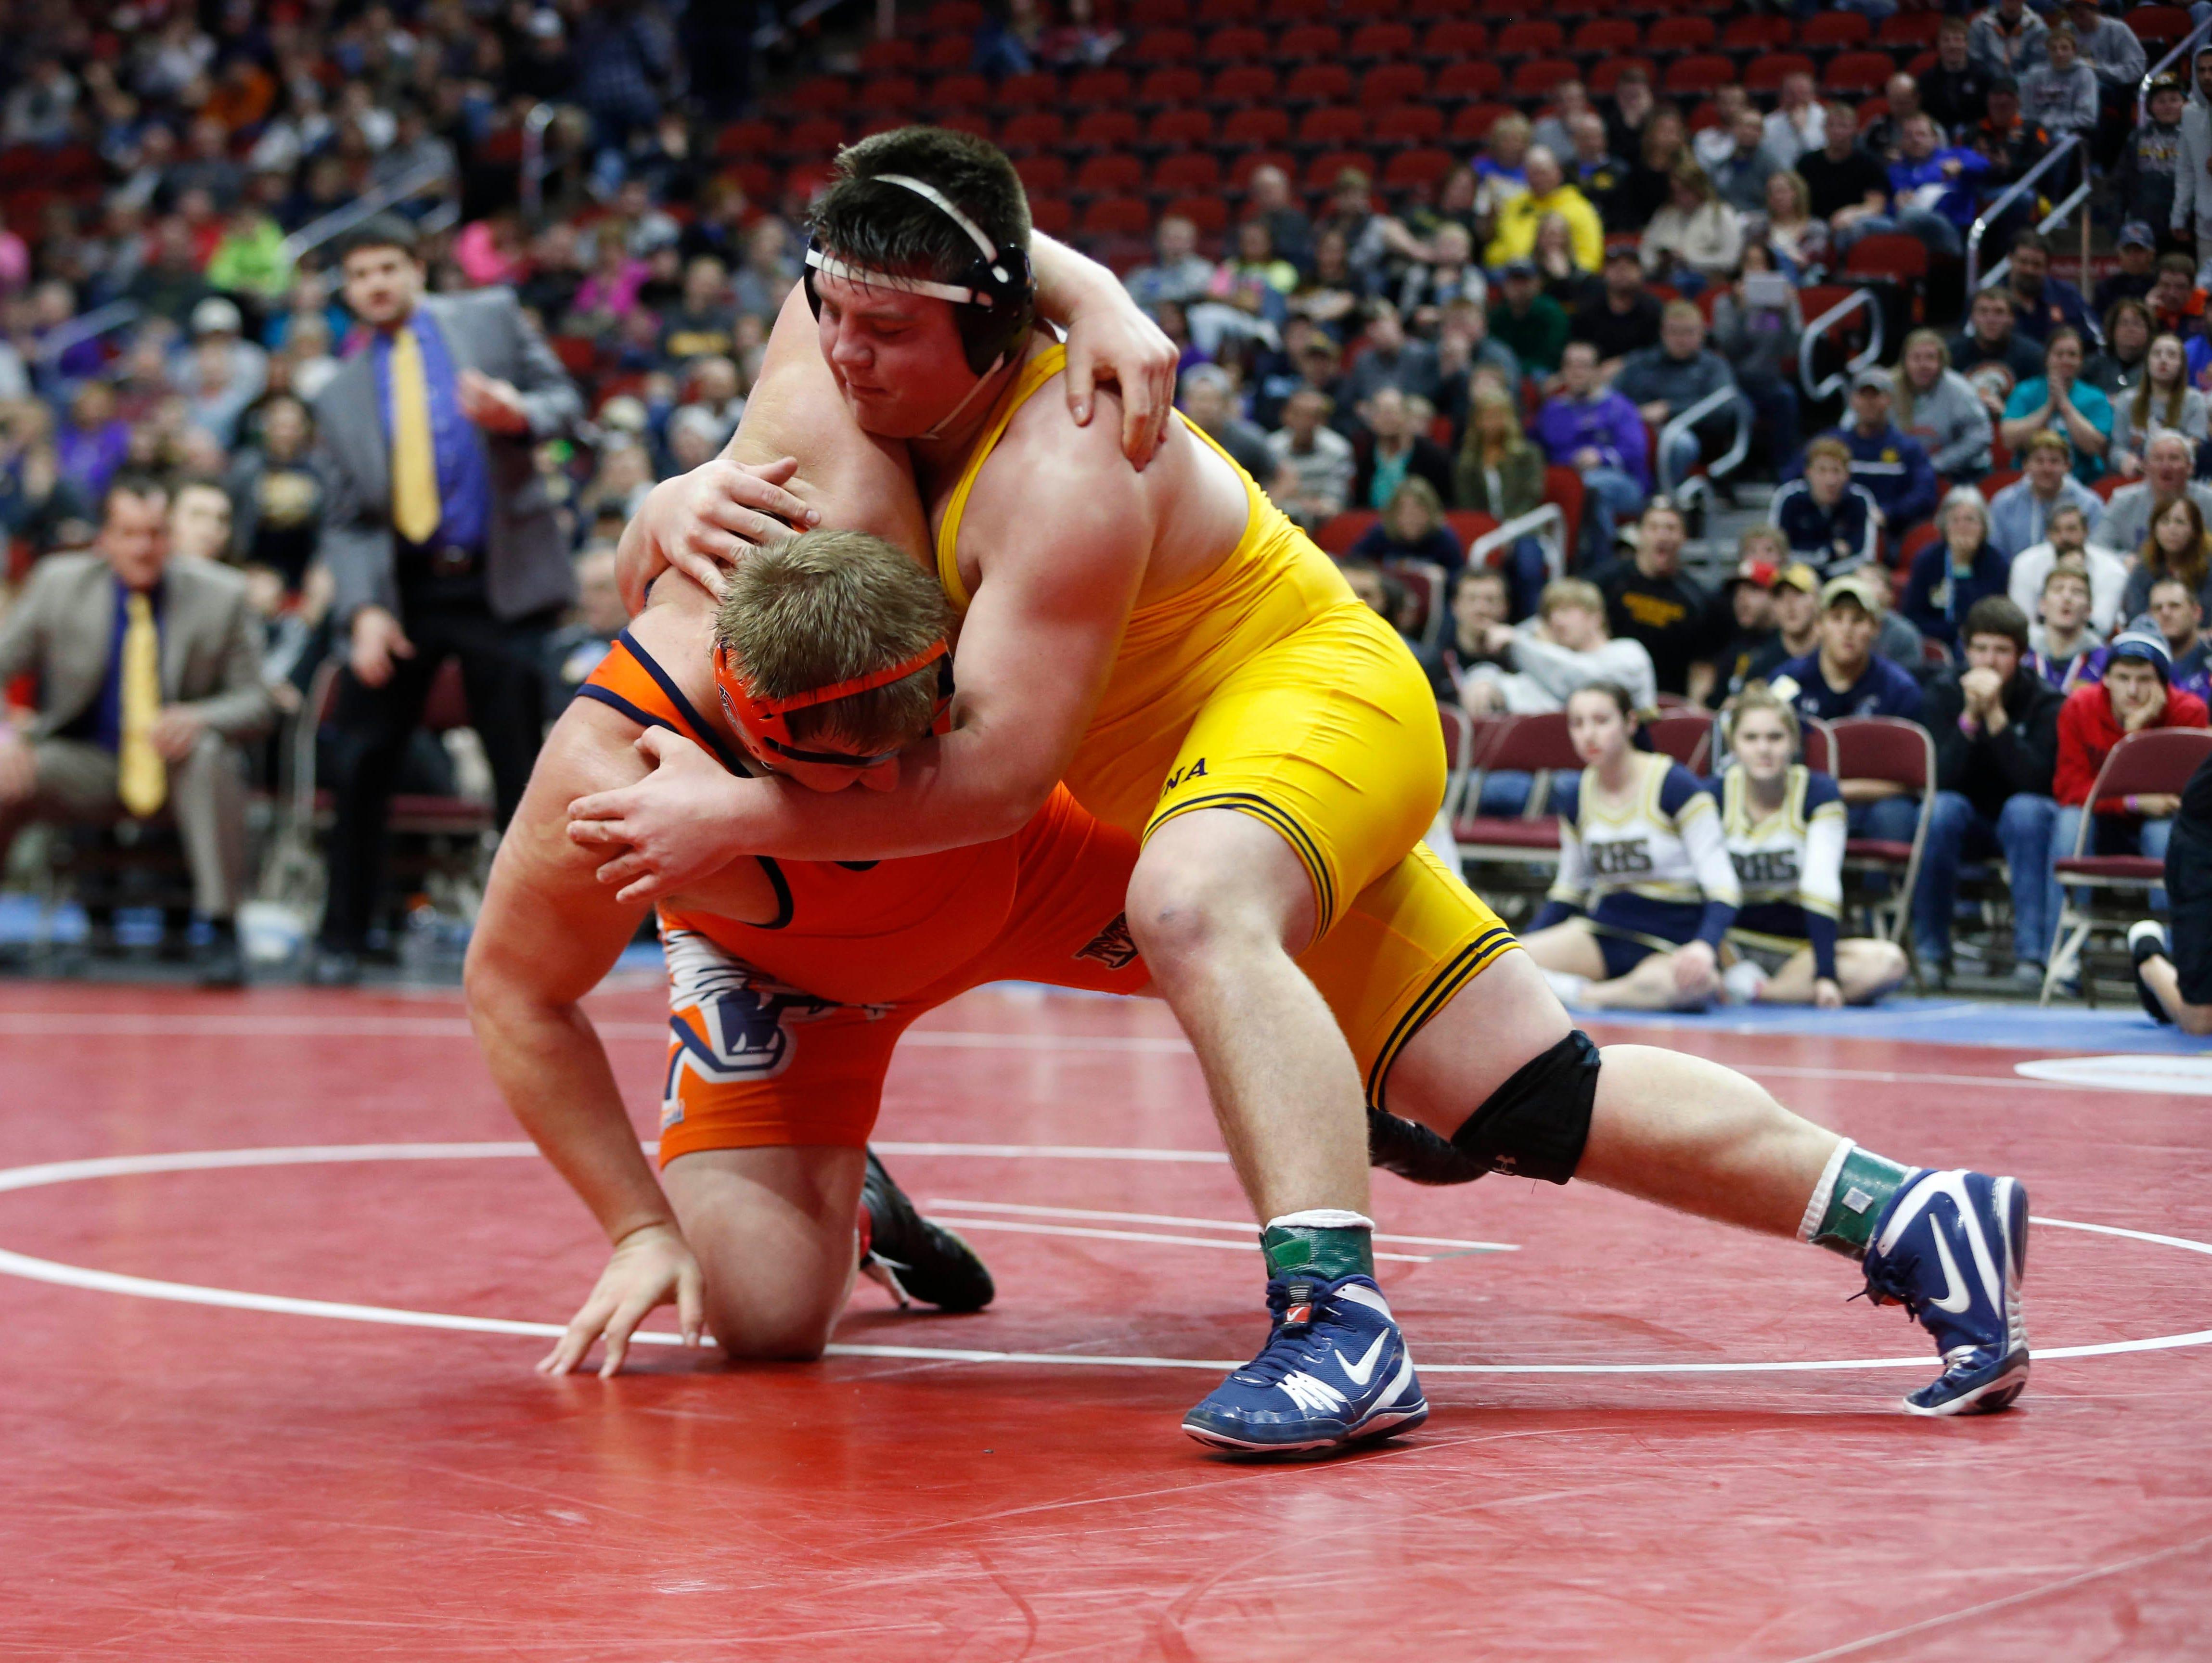 Manson Northwest's Tim Butcher (left) wrestles Regina's Jared Brinkman Saturday, Feb. 20, 2016 during the class 1A state wrestling tournament finals in Des Moines.